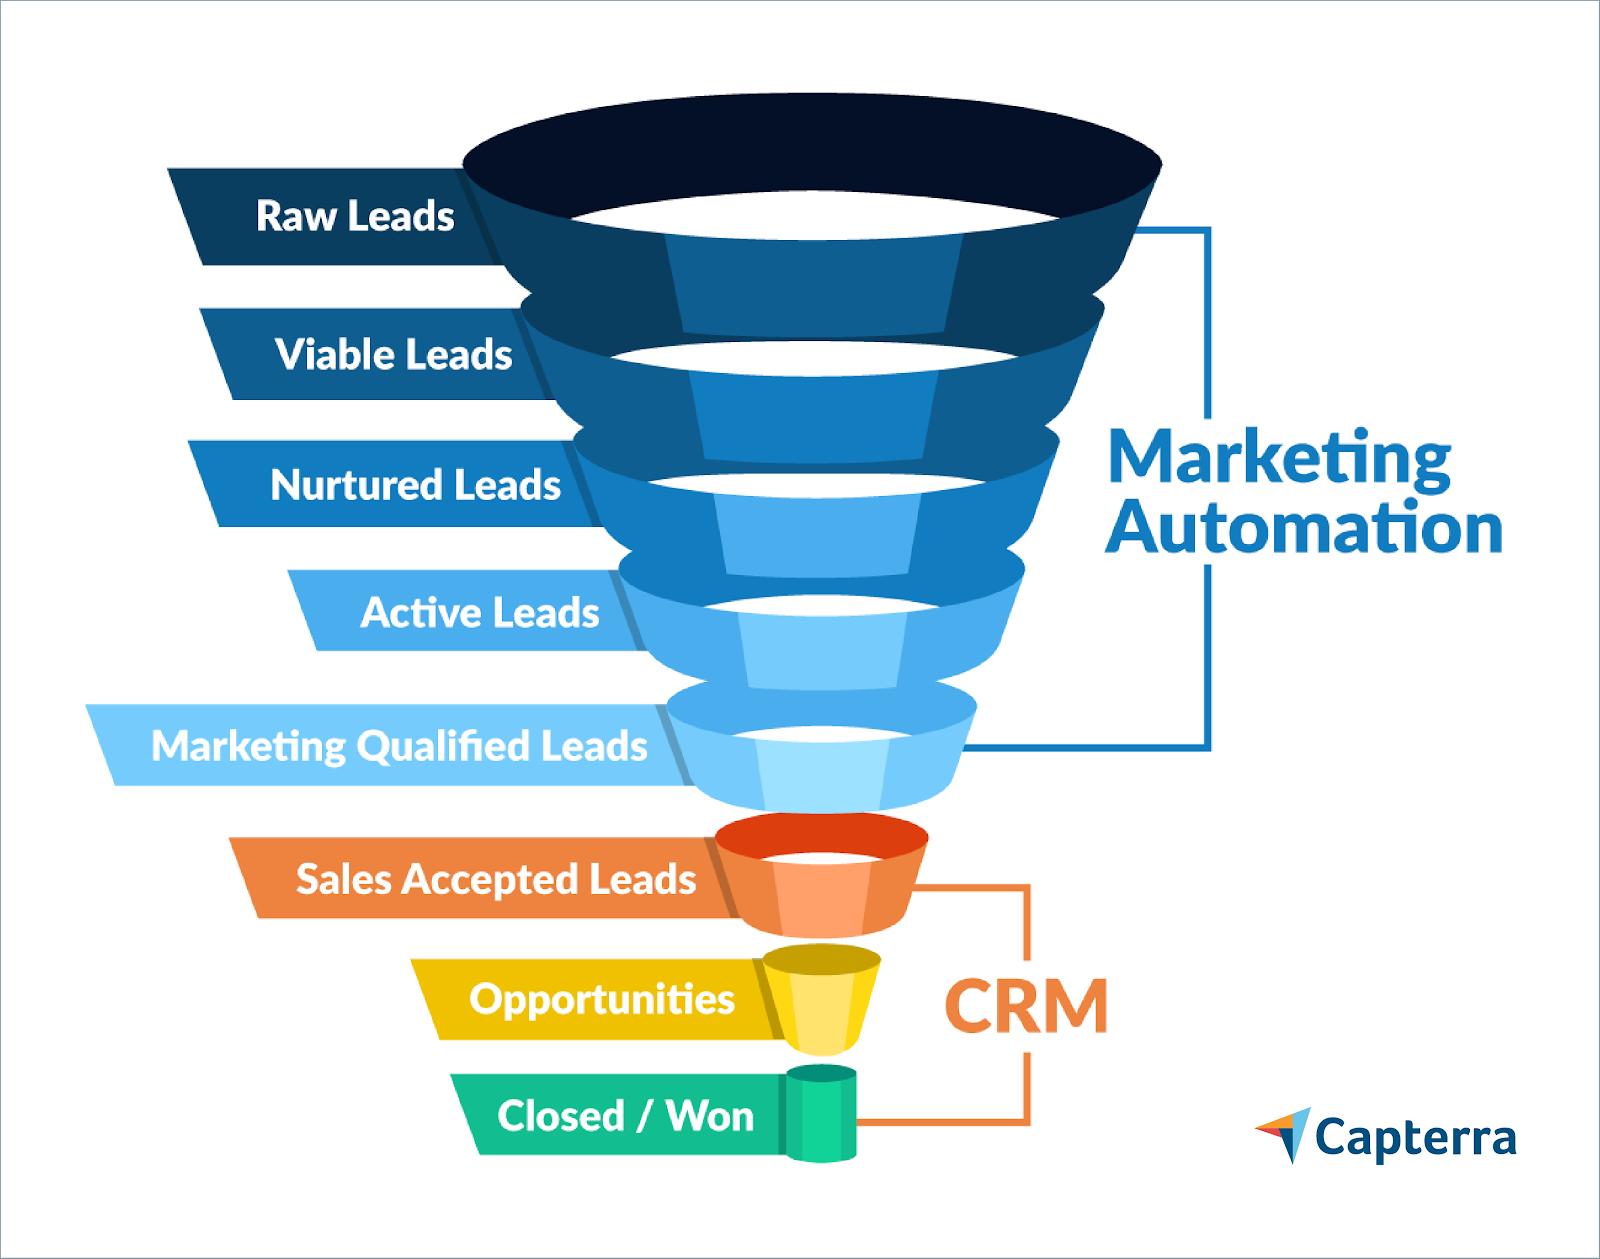 CRM ou Marketing Automation